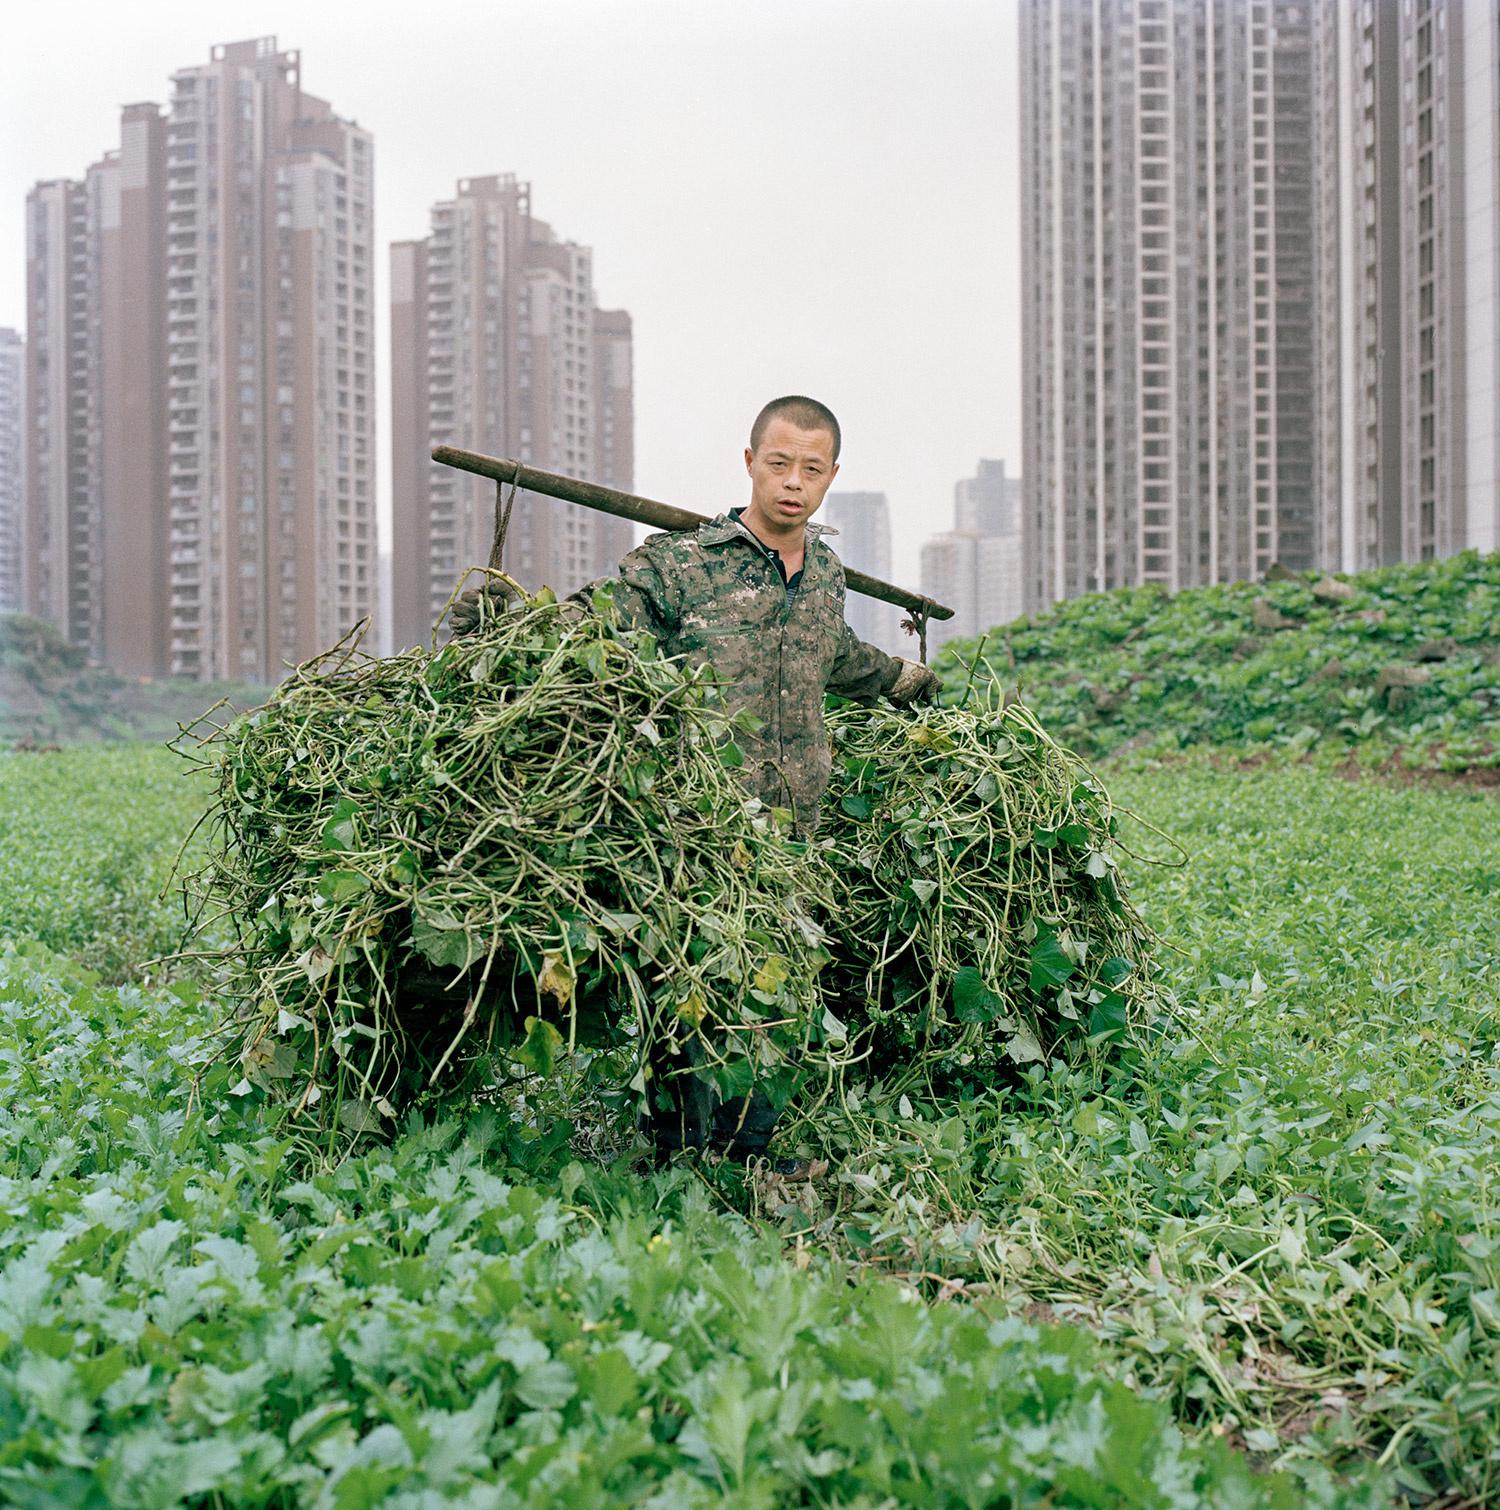 Metamorpolis: the Insatiable Sprawl of Chongqing